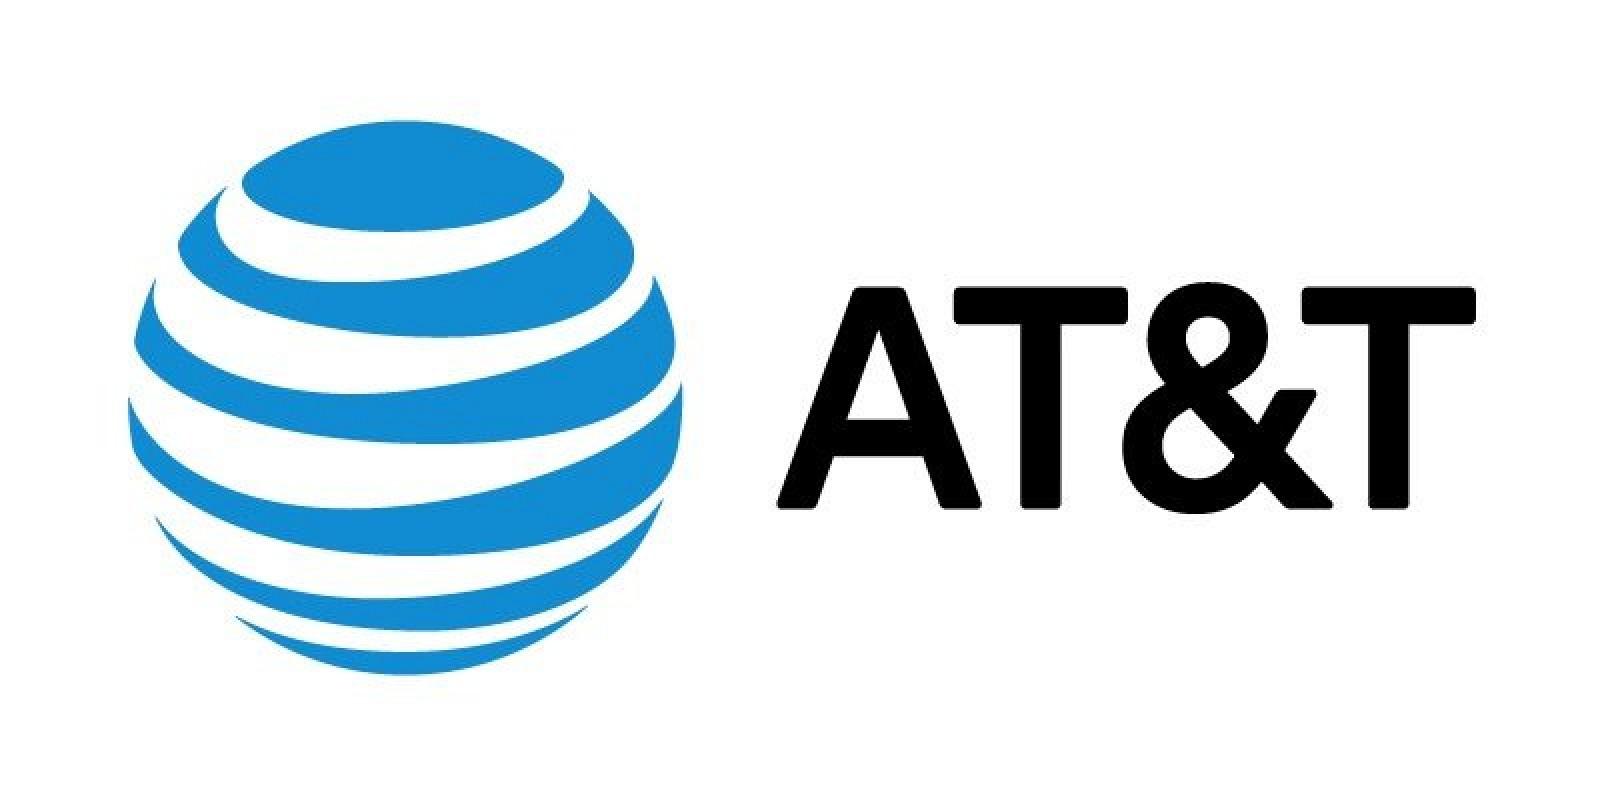 ATT-new-2016-logo-featured-800x400.jpg